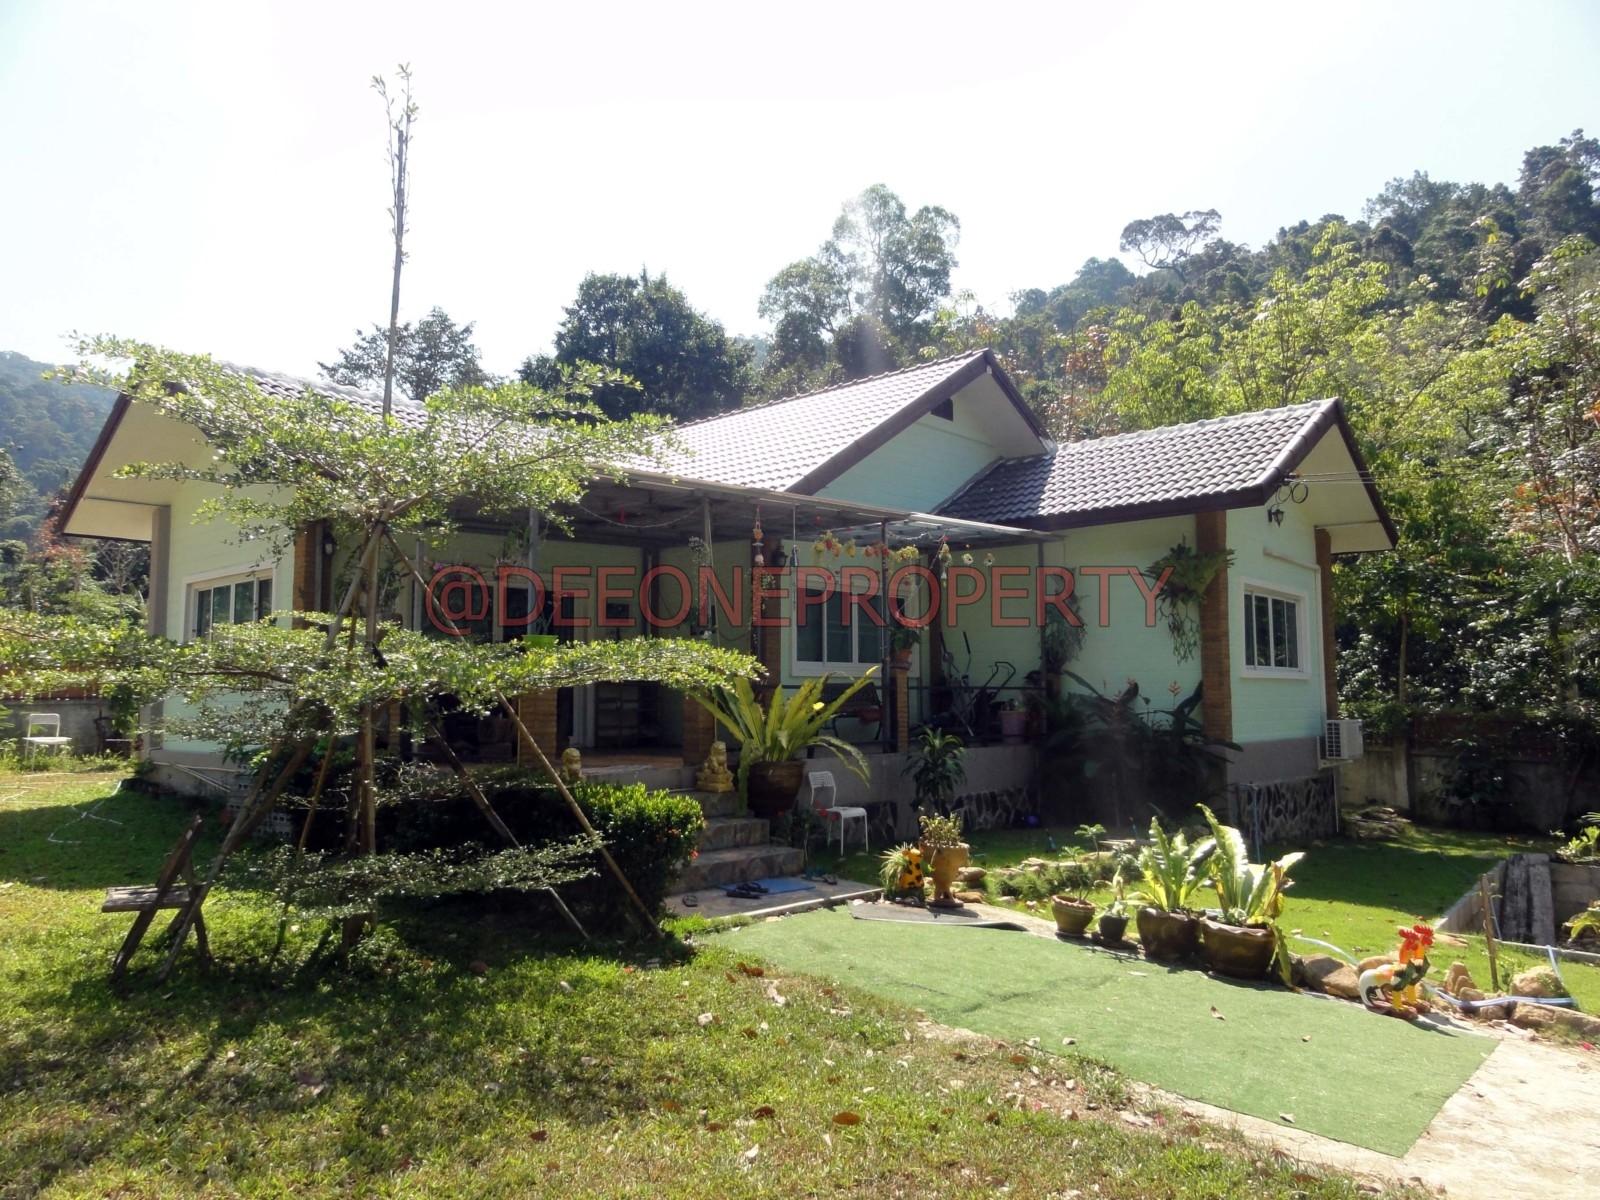 Belle maison avec 2 chambres louer kai bae koh chang - Maison 2 chambres a louer ...